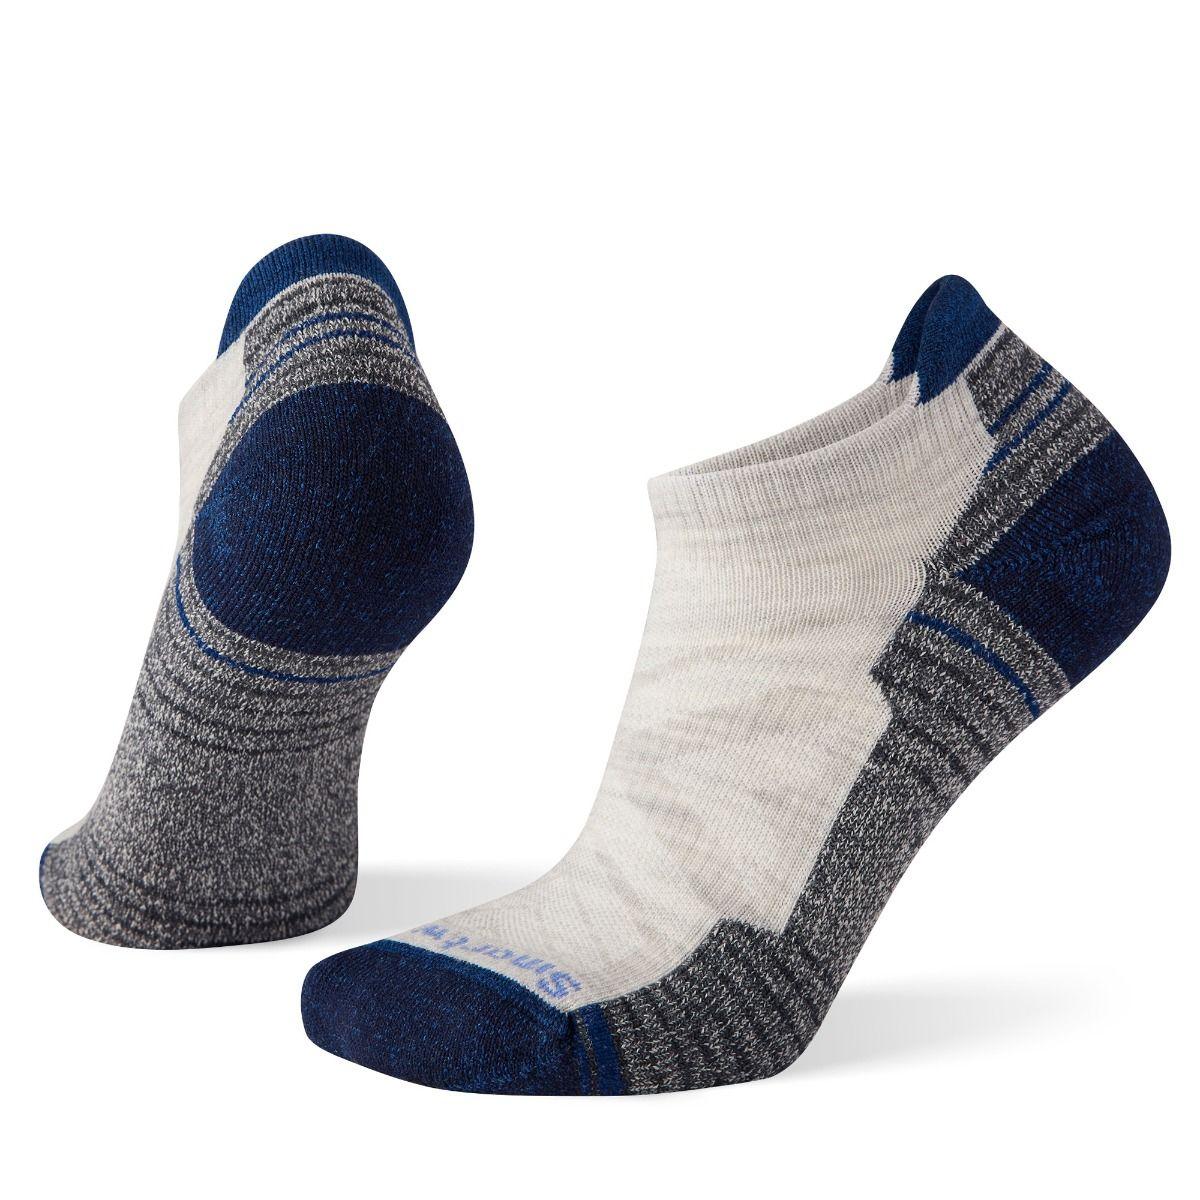 Women's Hike Light Cushion Low Ankle Socks